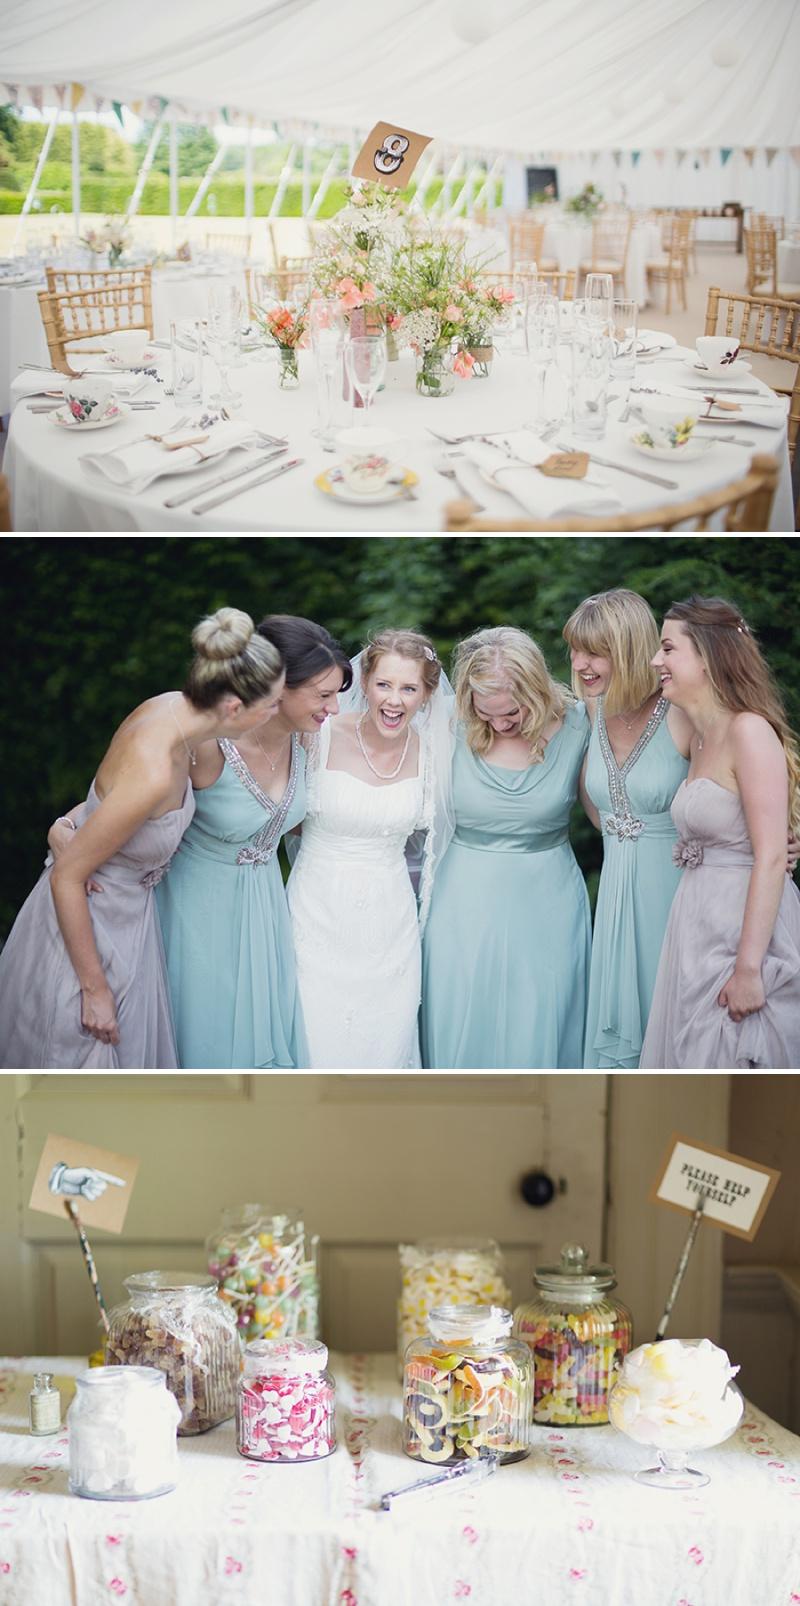 Monsoon Bridesmaid Dresses Archives - ROCK MY WEDDING | UK WEDDING ...